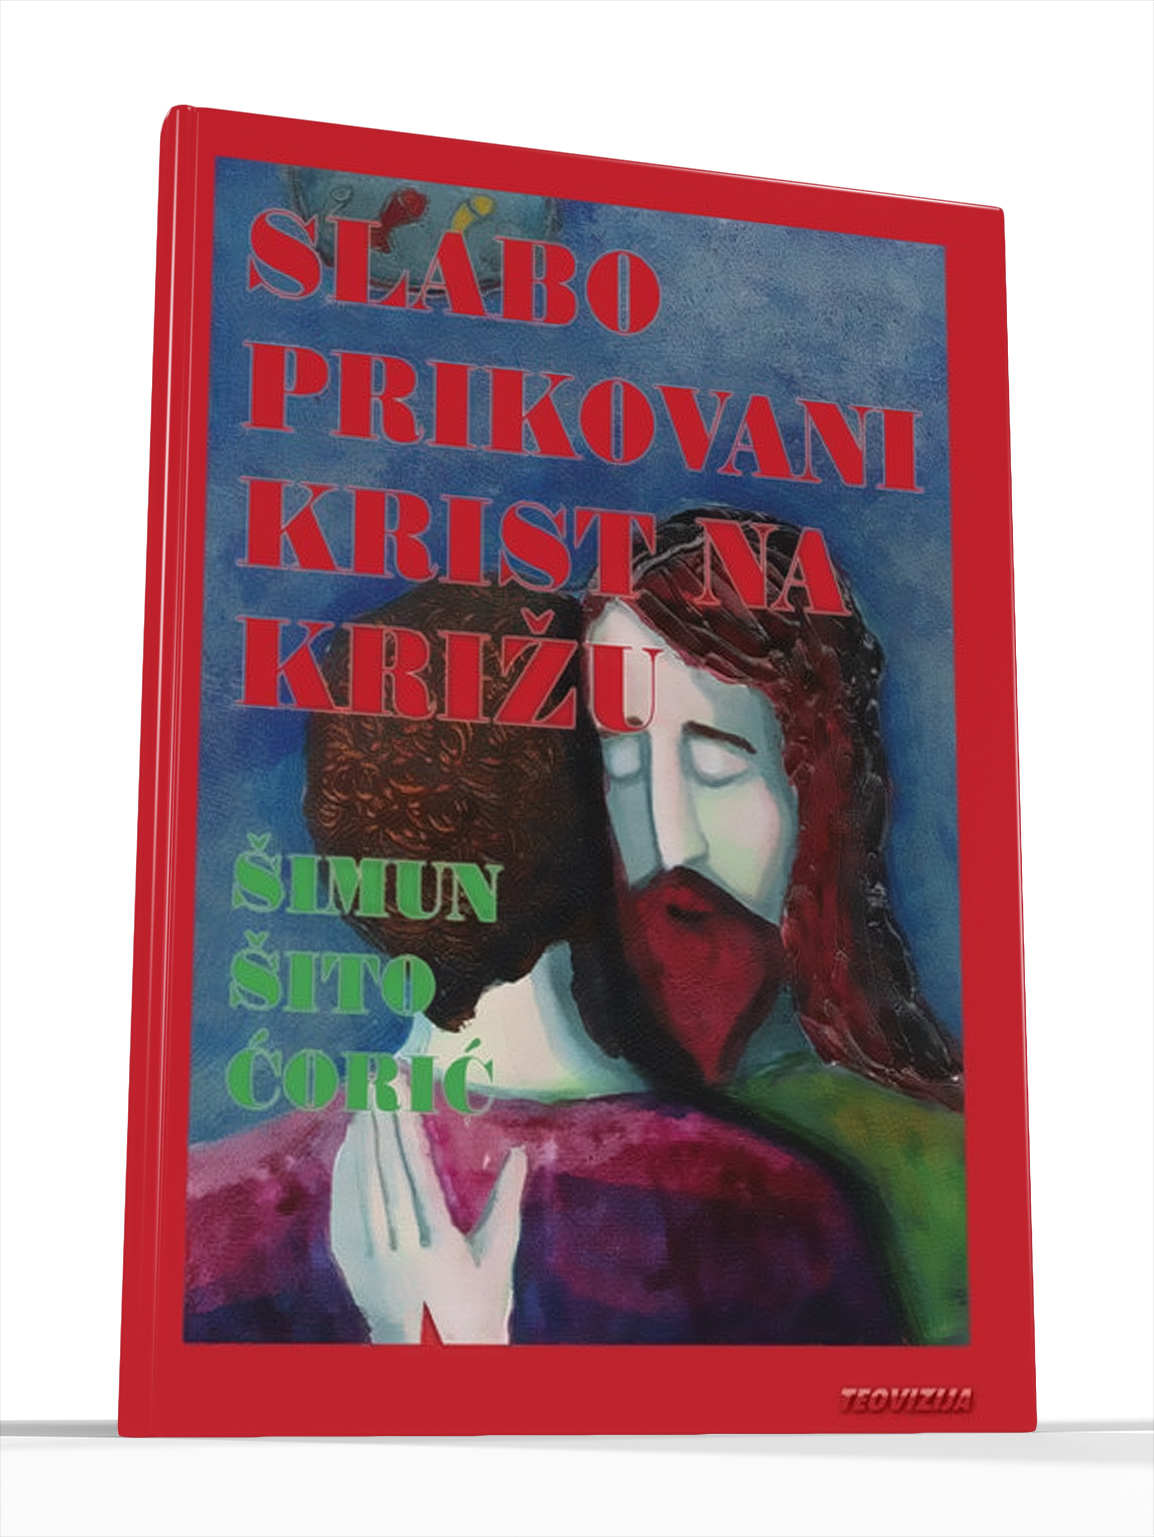 SLABO PRIKOVANI KRIST NA KRIŽU - fra Šito Čorić